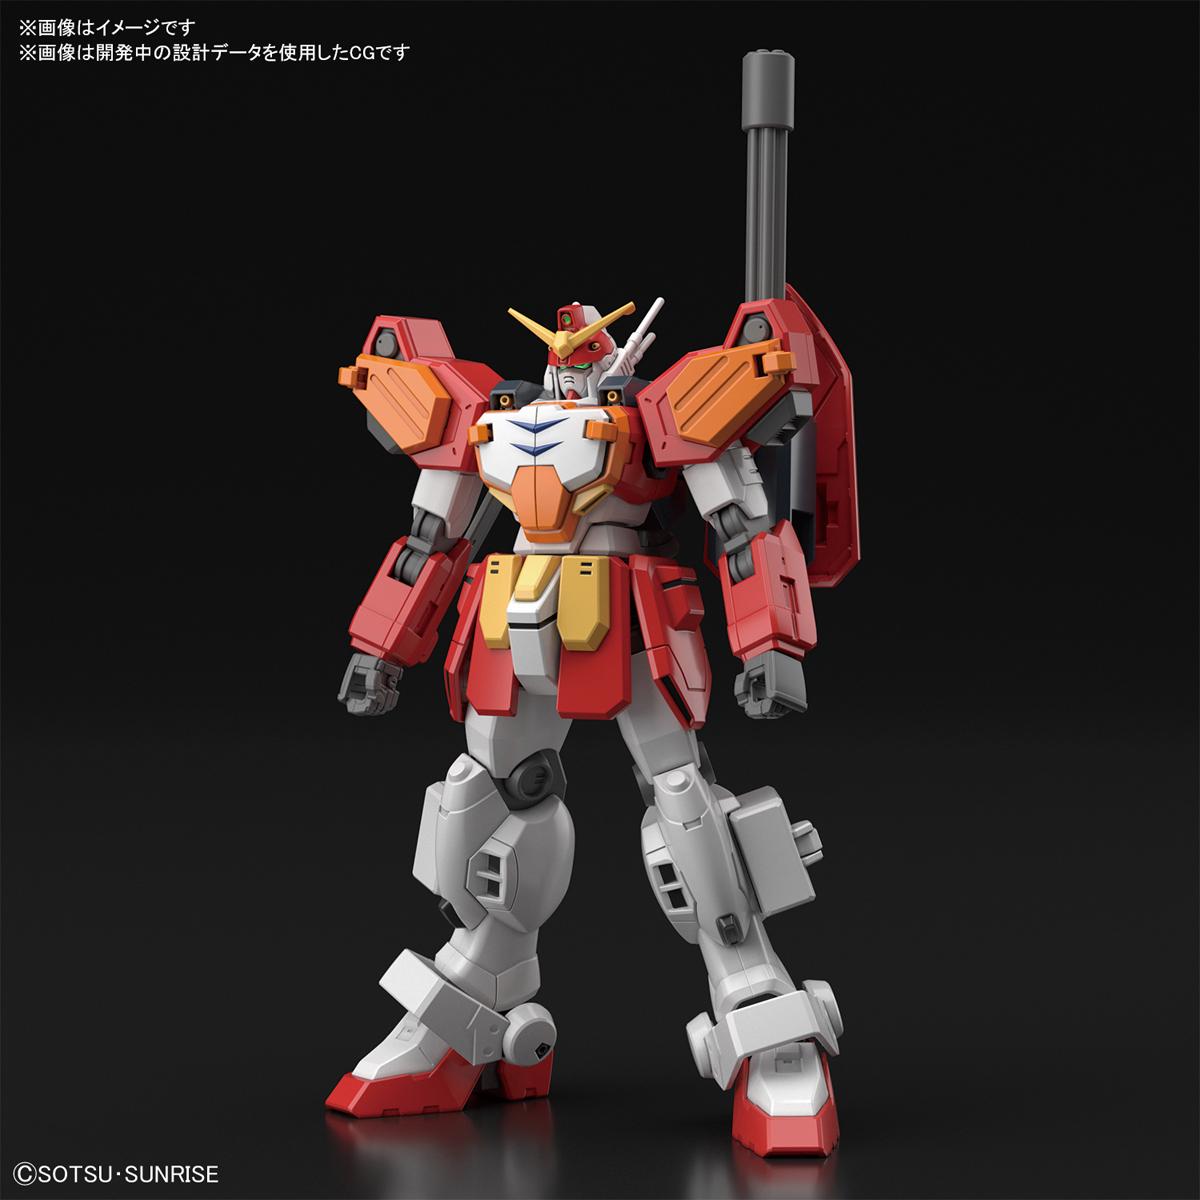 HGAC 1/144 XXXG-01H ガンダムヘビーアームズ [Gundam Heavyarms] 5060745